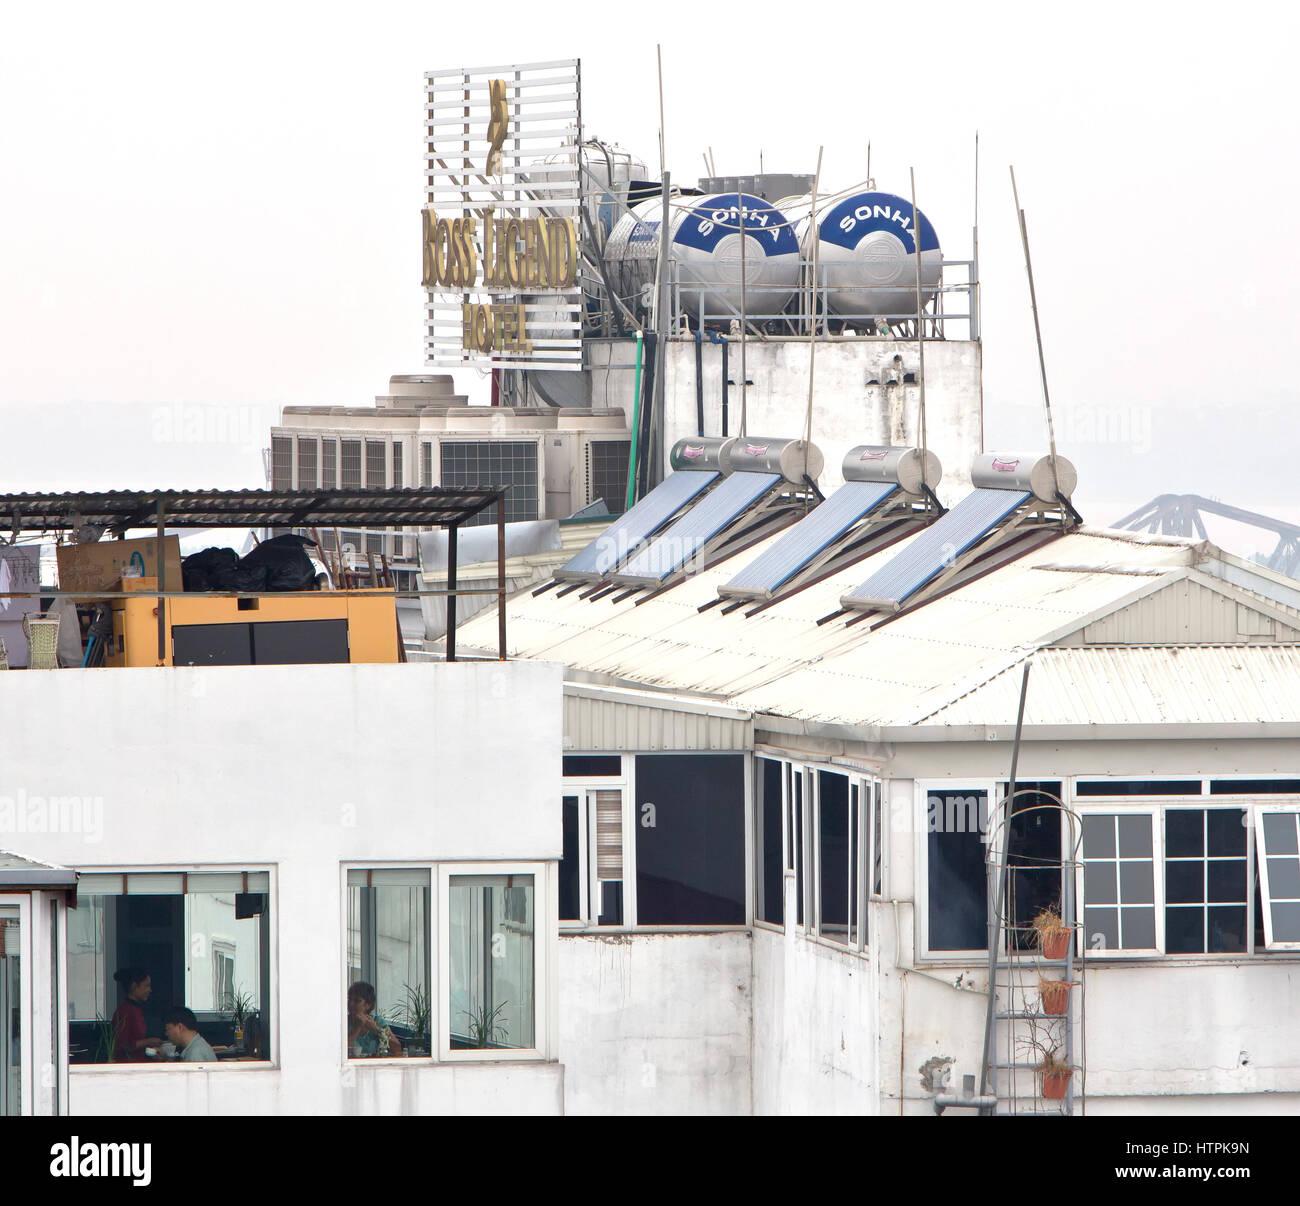 Calentadores solares de agua con tanques de agua instalado en el tejado, Boss Legend Hotel, de gran altura. Imagen De Stock